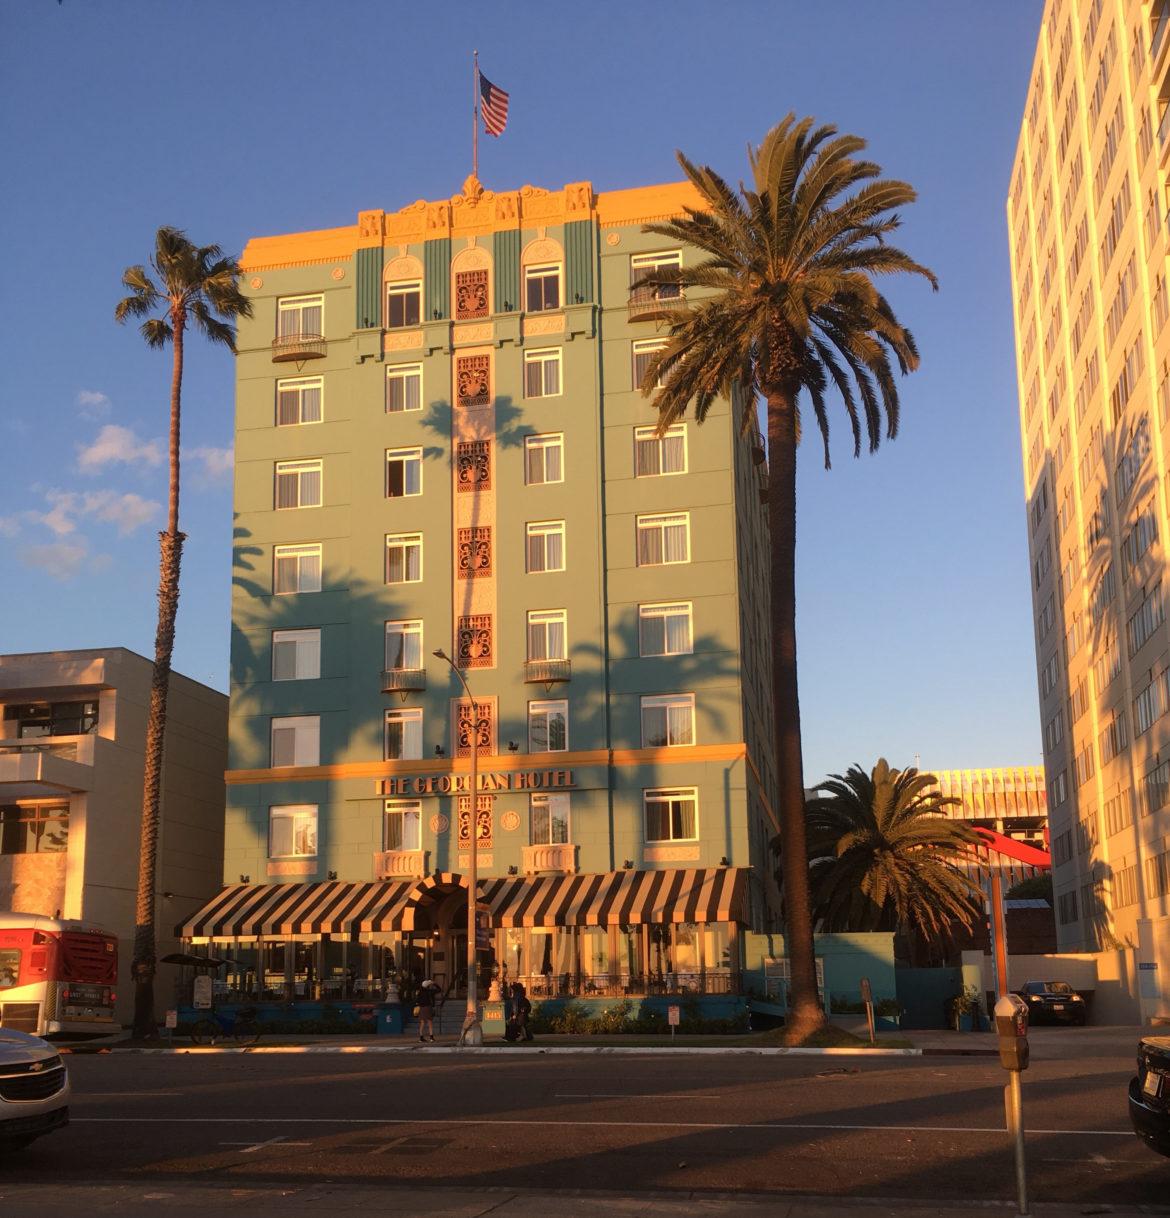 USA: The Georgian Hotel